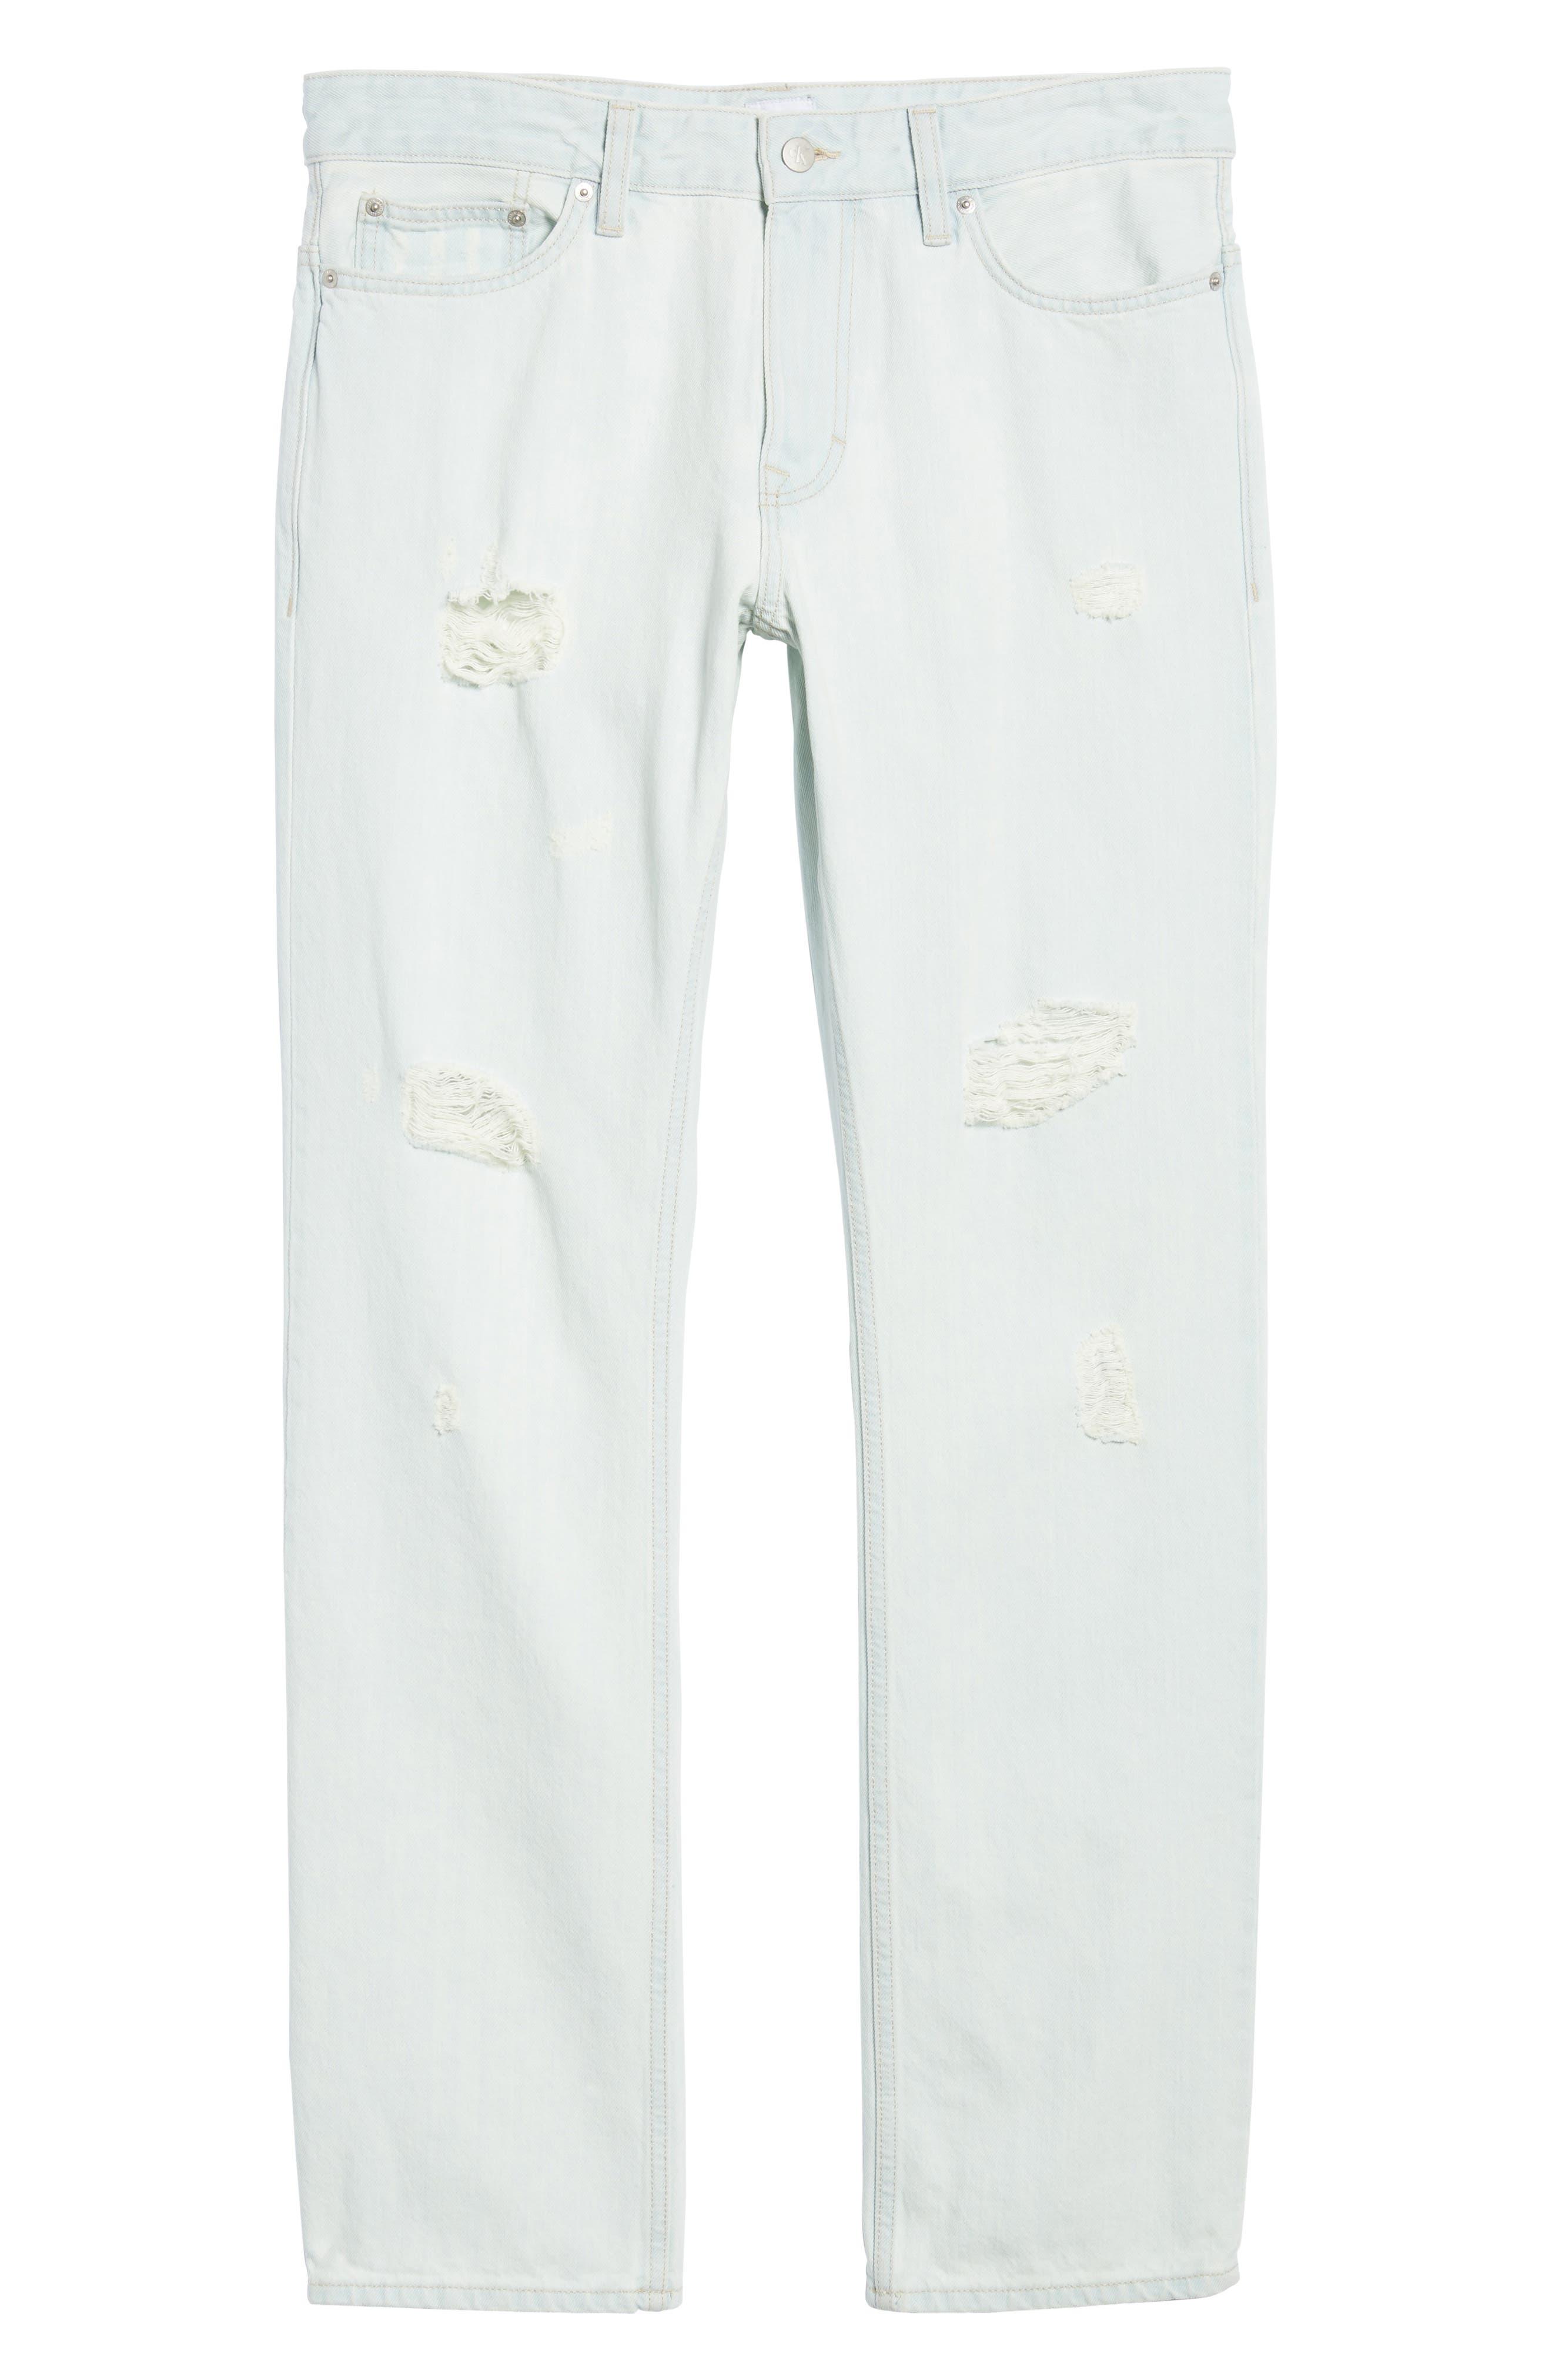 Slim Jeans,                             Alternate thumbnail 6, color,                             400